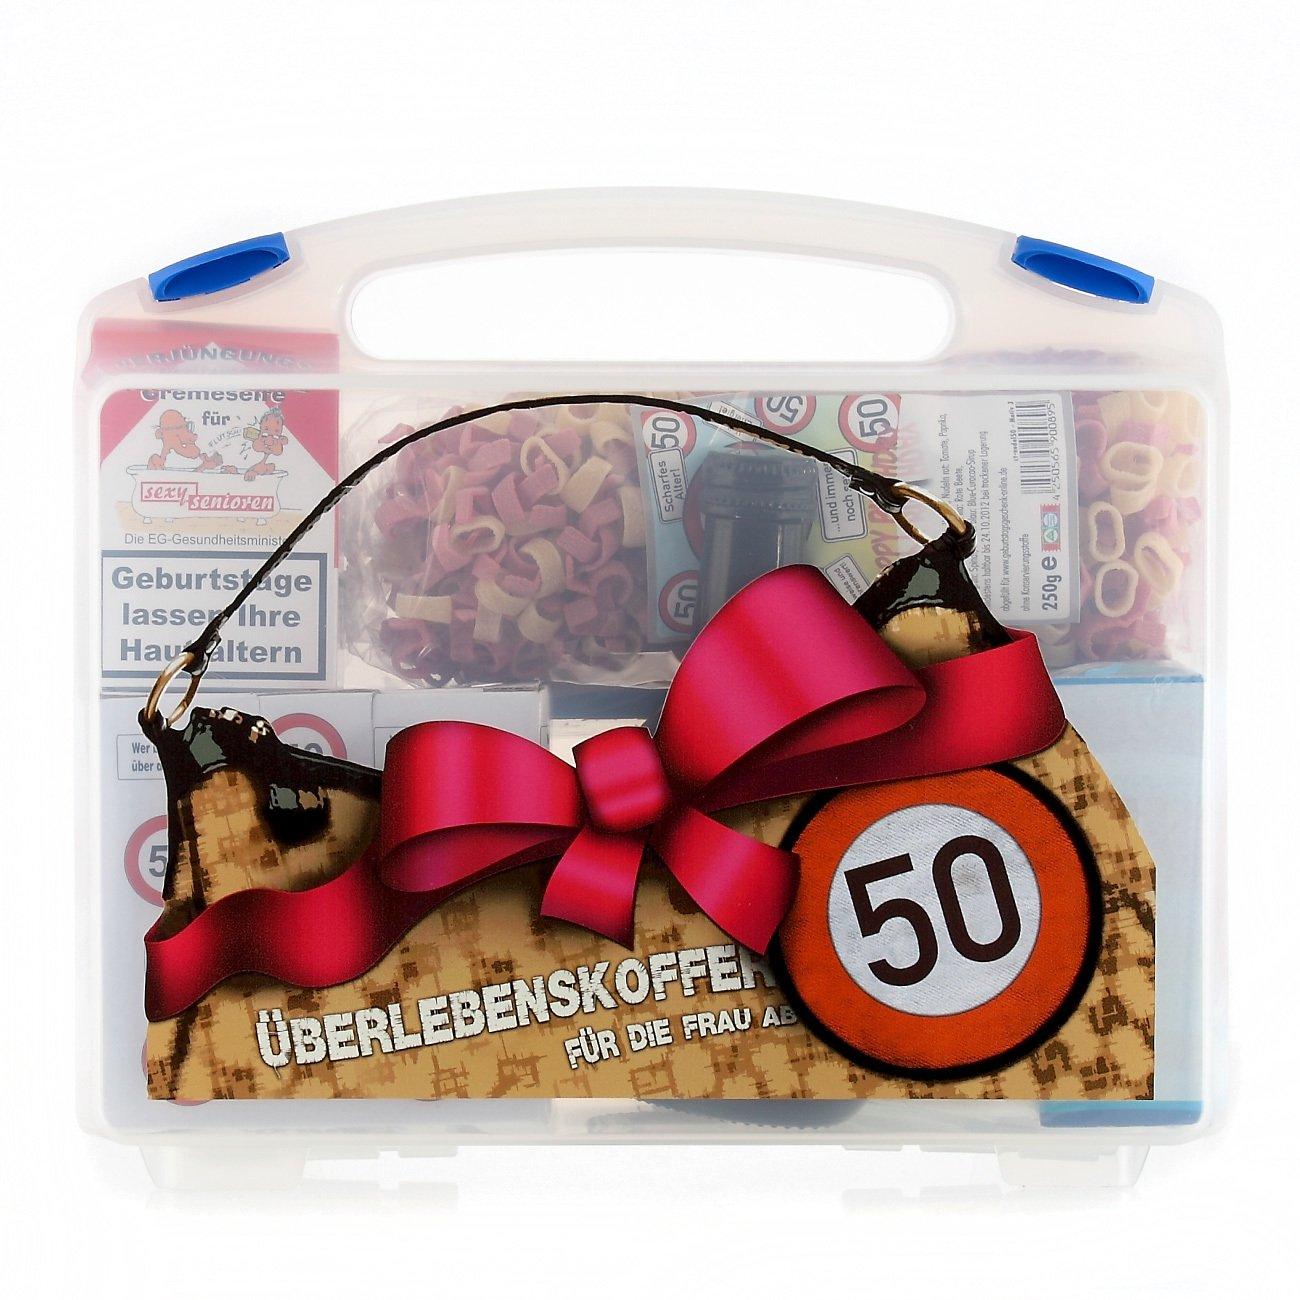 Lustige Apotheke Überlebenskoffer für die Frau ab 50 (8 teilig) Lustapotheke®